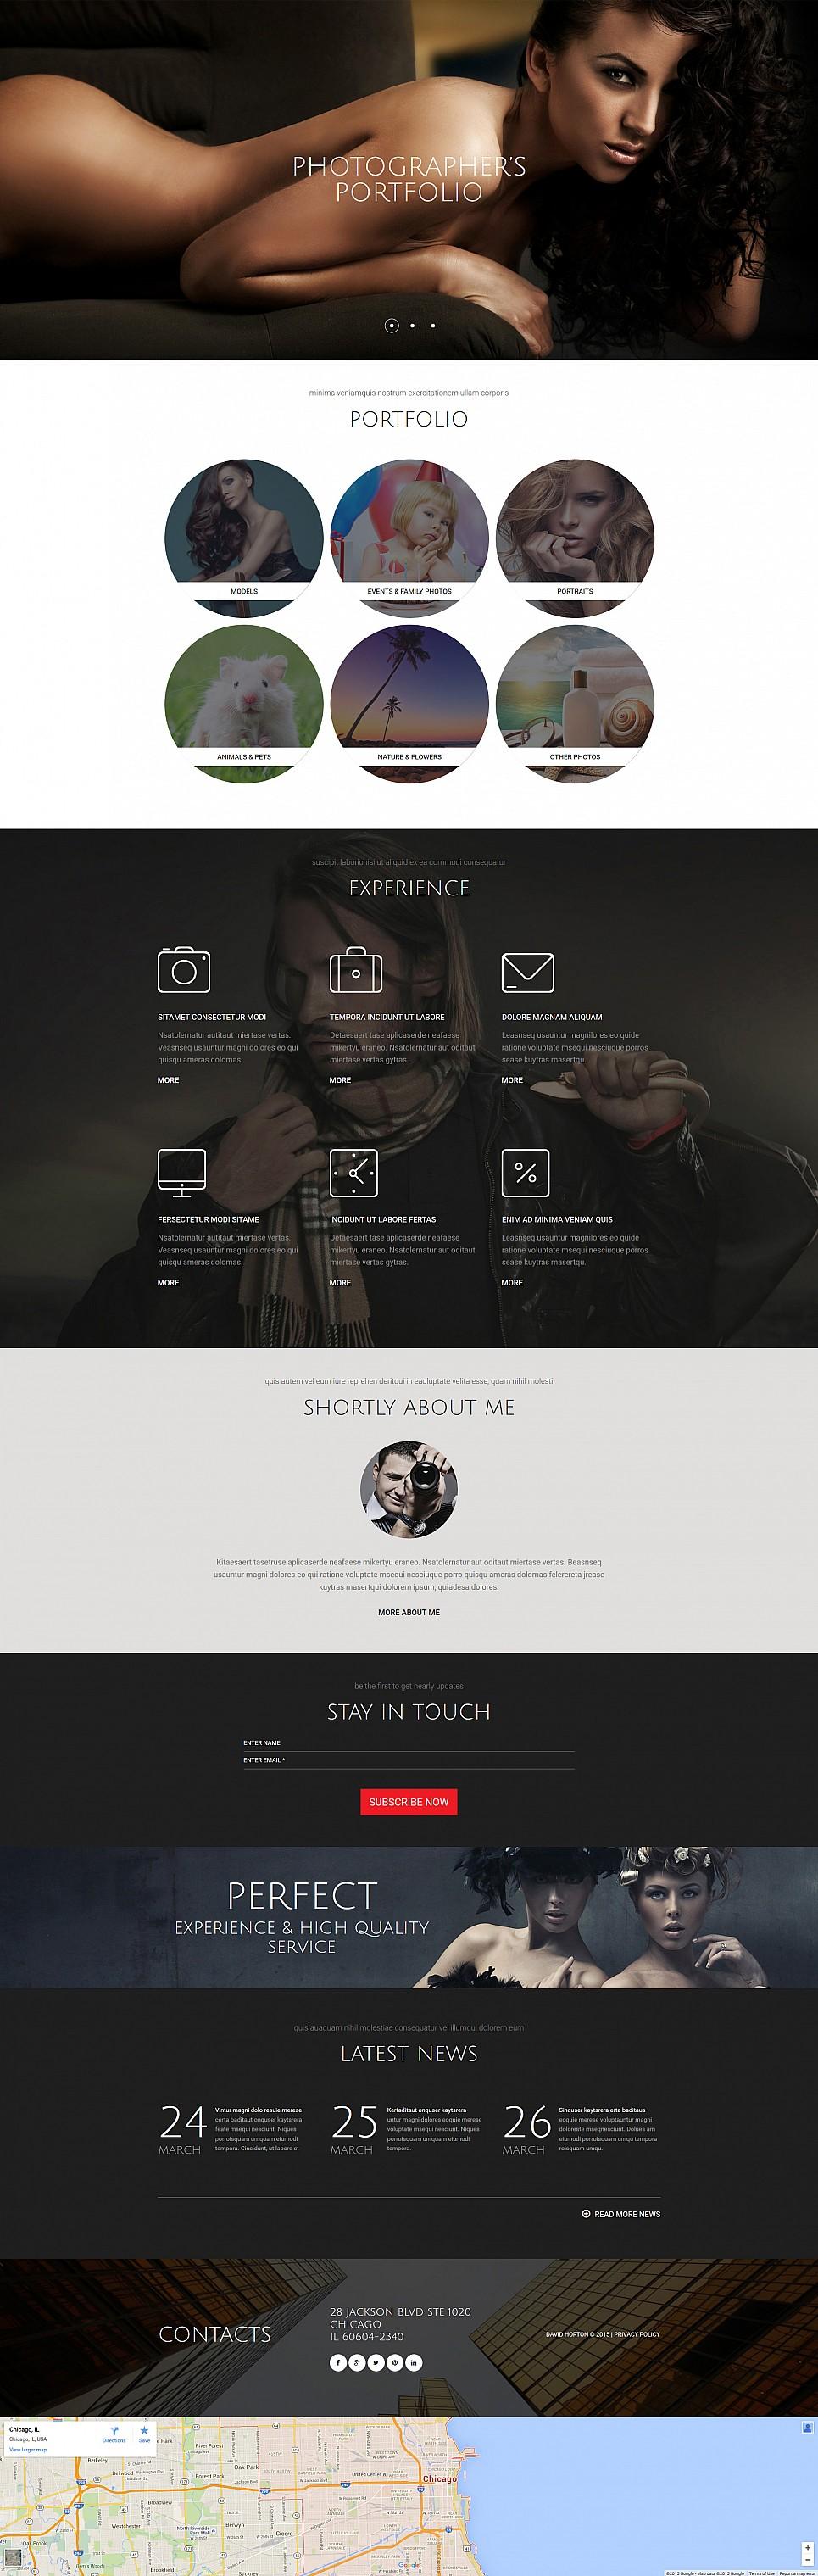 Online portfolio theme for photographers